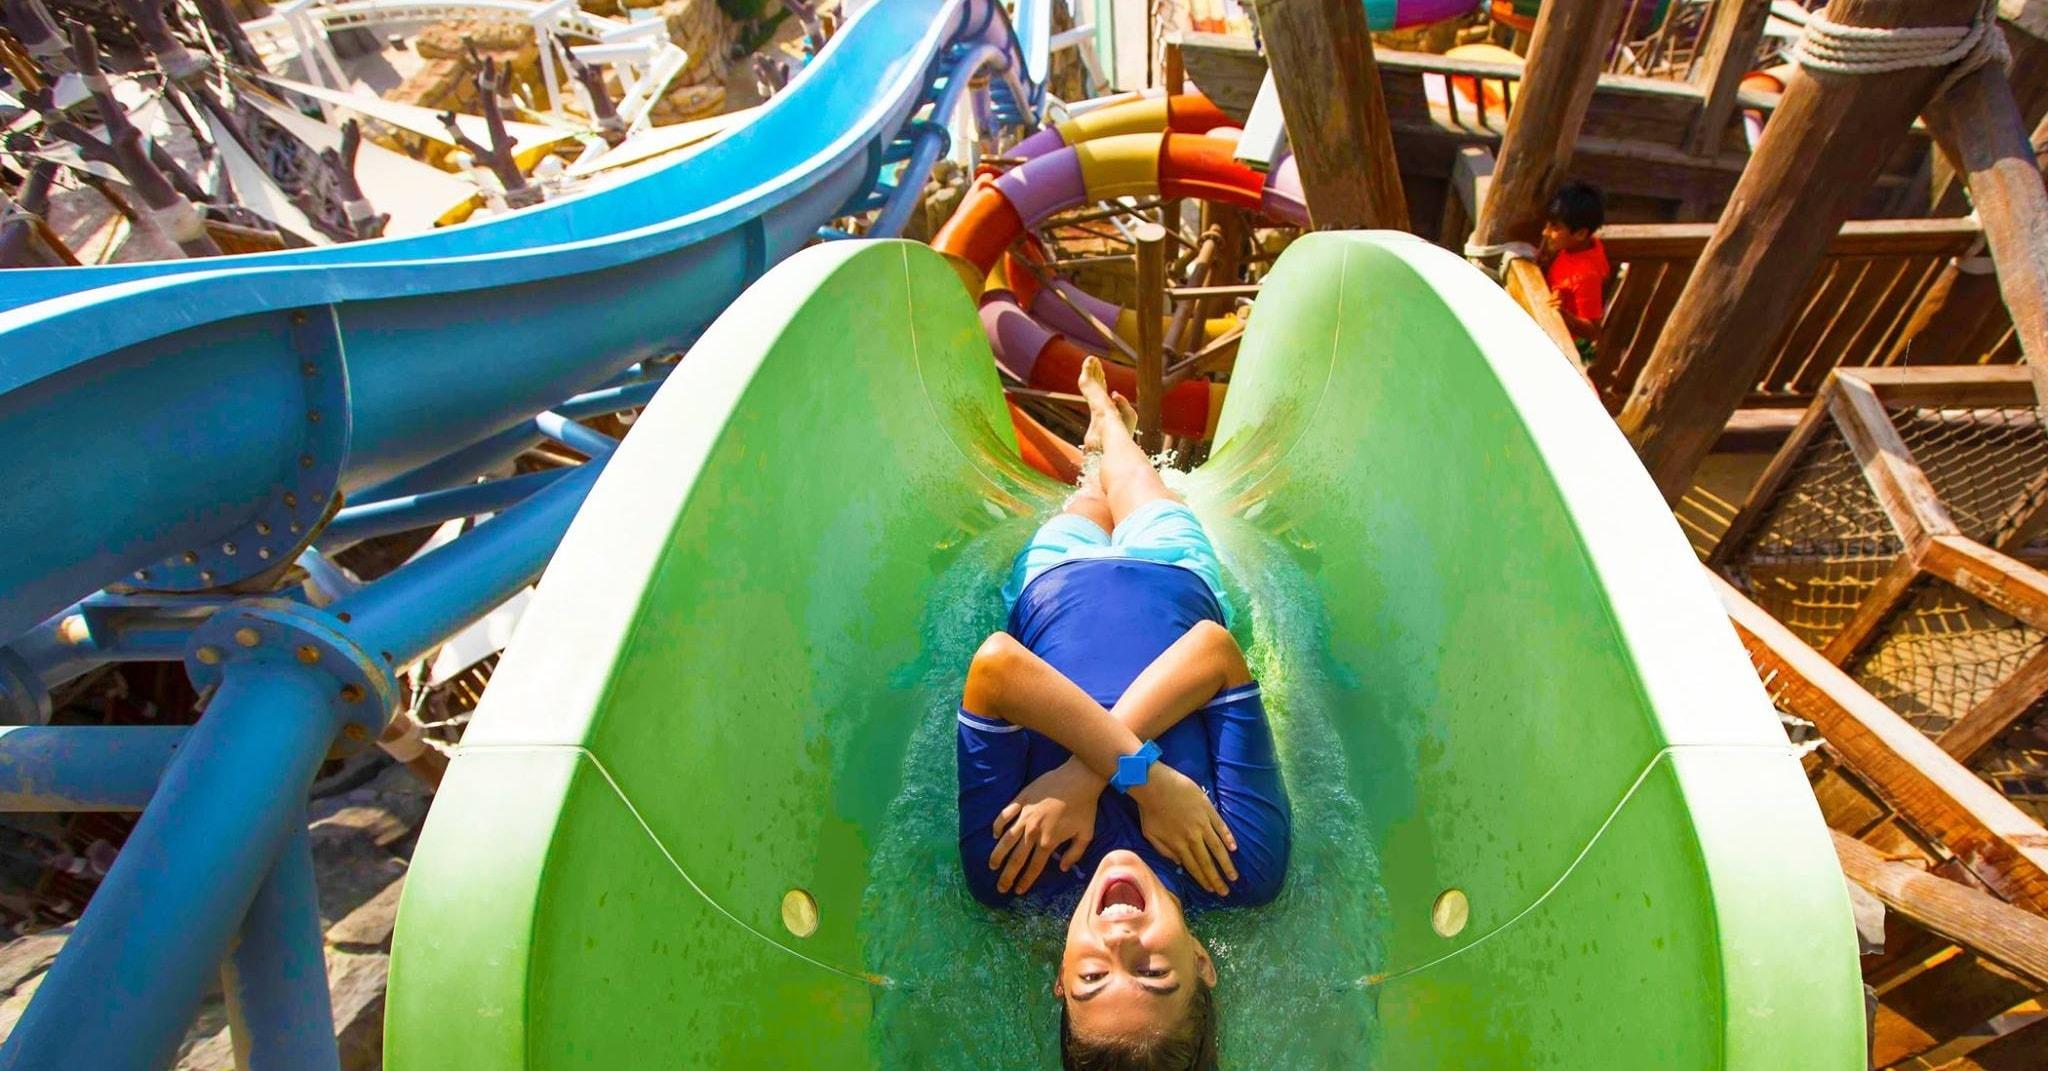 Yas Waterworld waterpark in Abu Dhabi